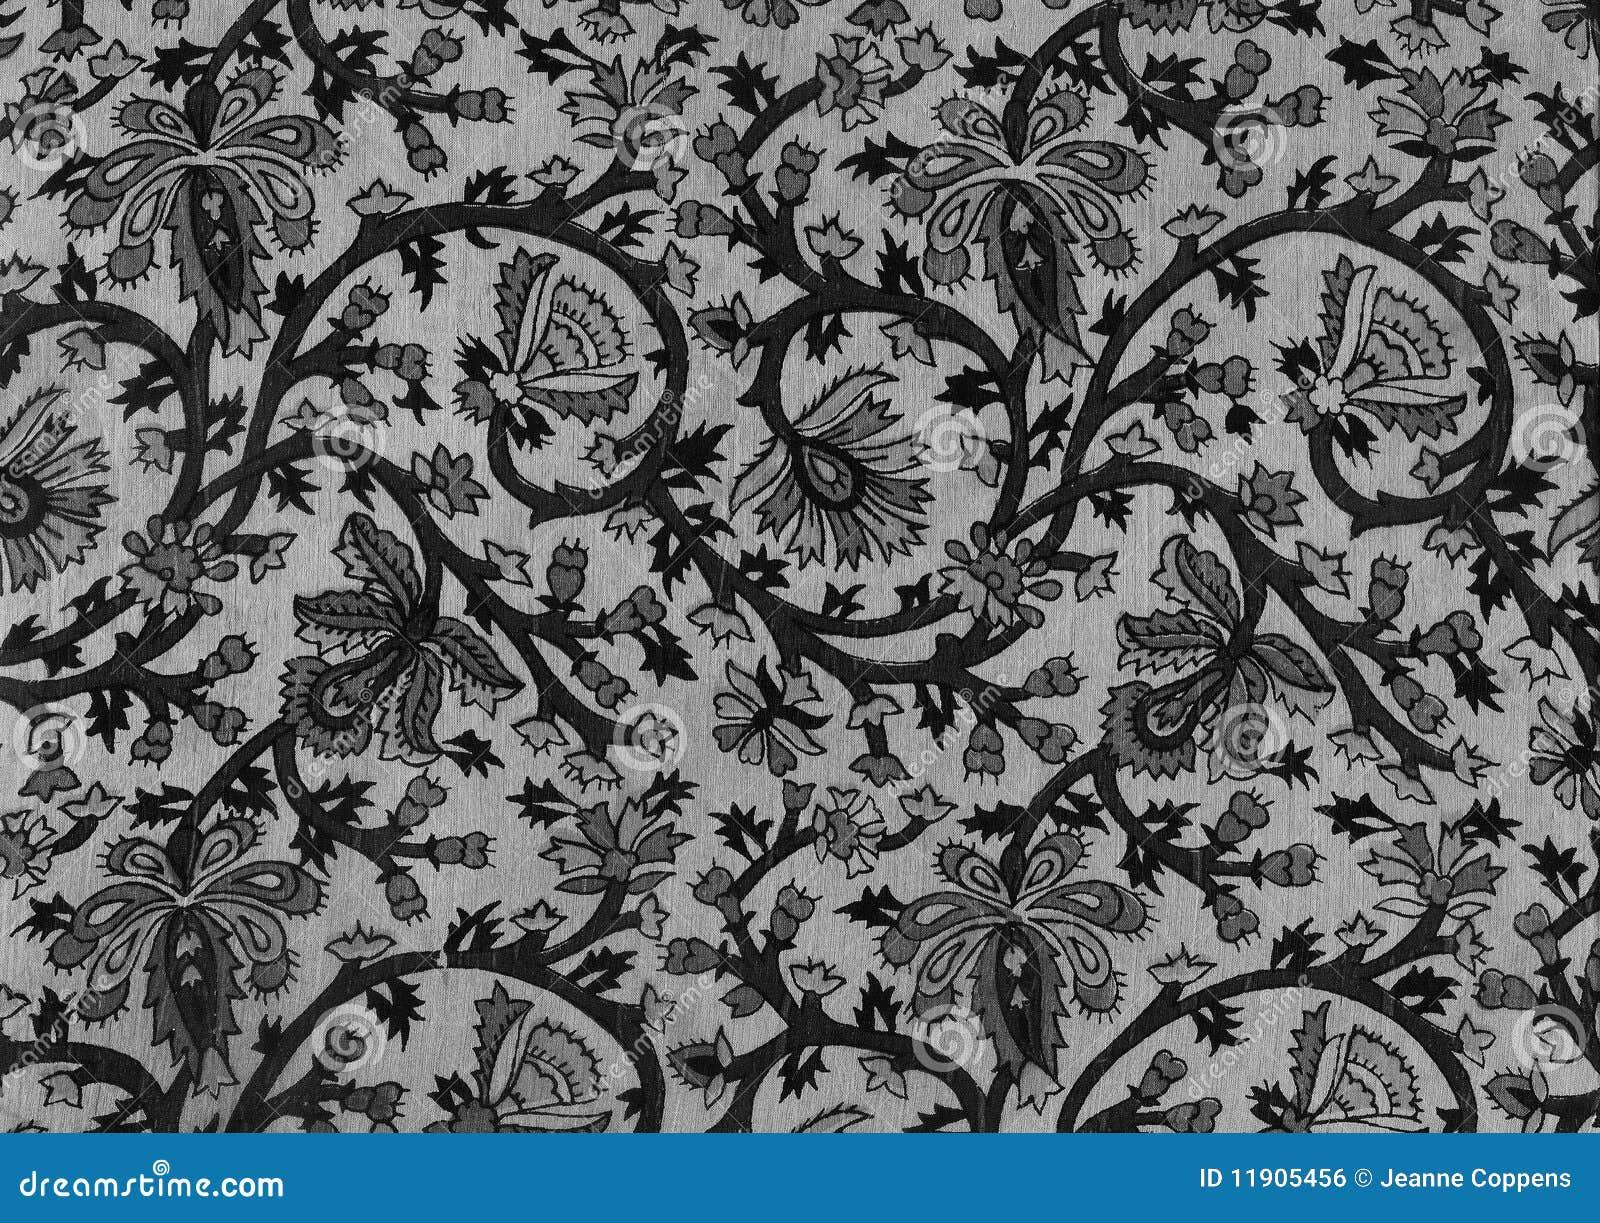 Batik design royalty free stock photos image 29546988 -  Vector Motif Free Batik Image Free Batik 11905456 Black Indian Stock Royalty Image